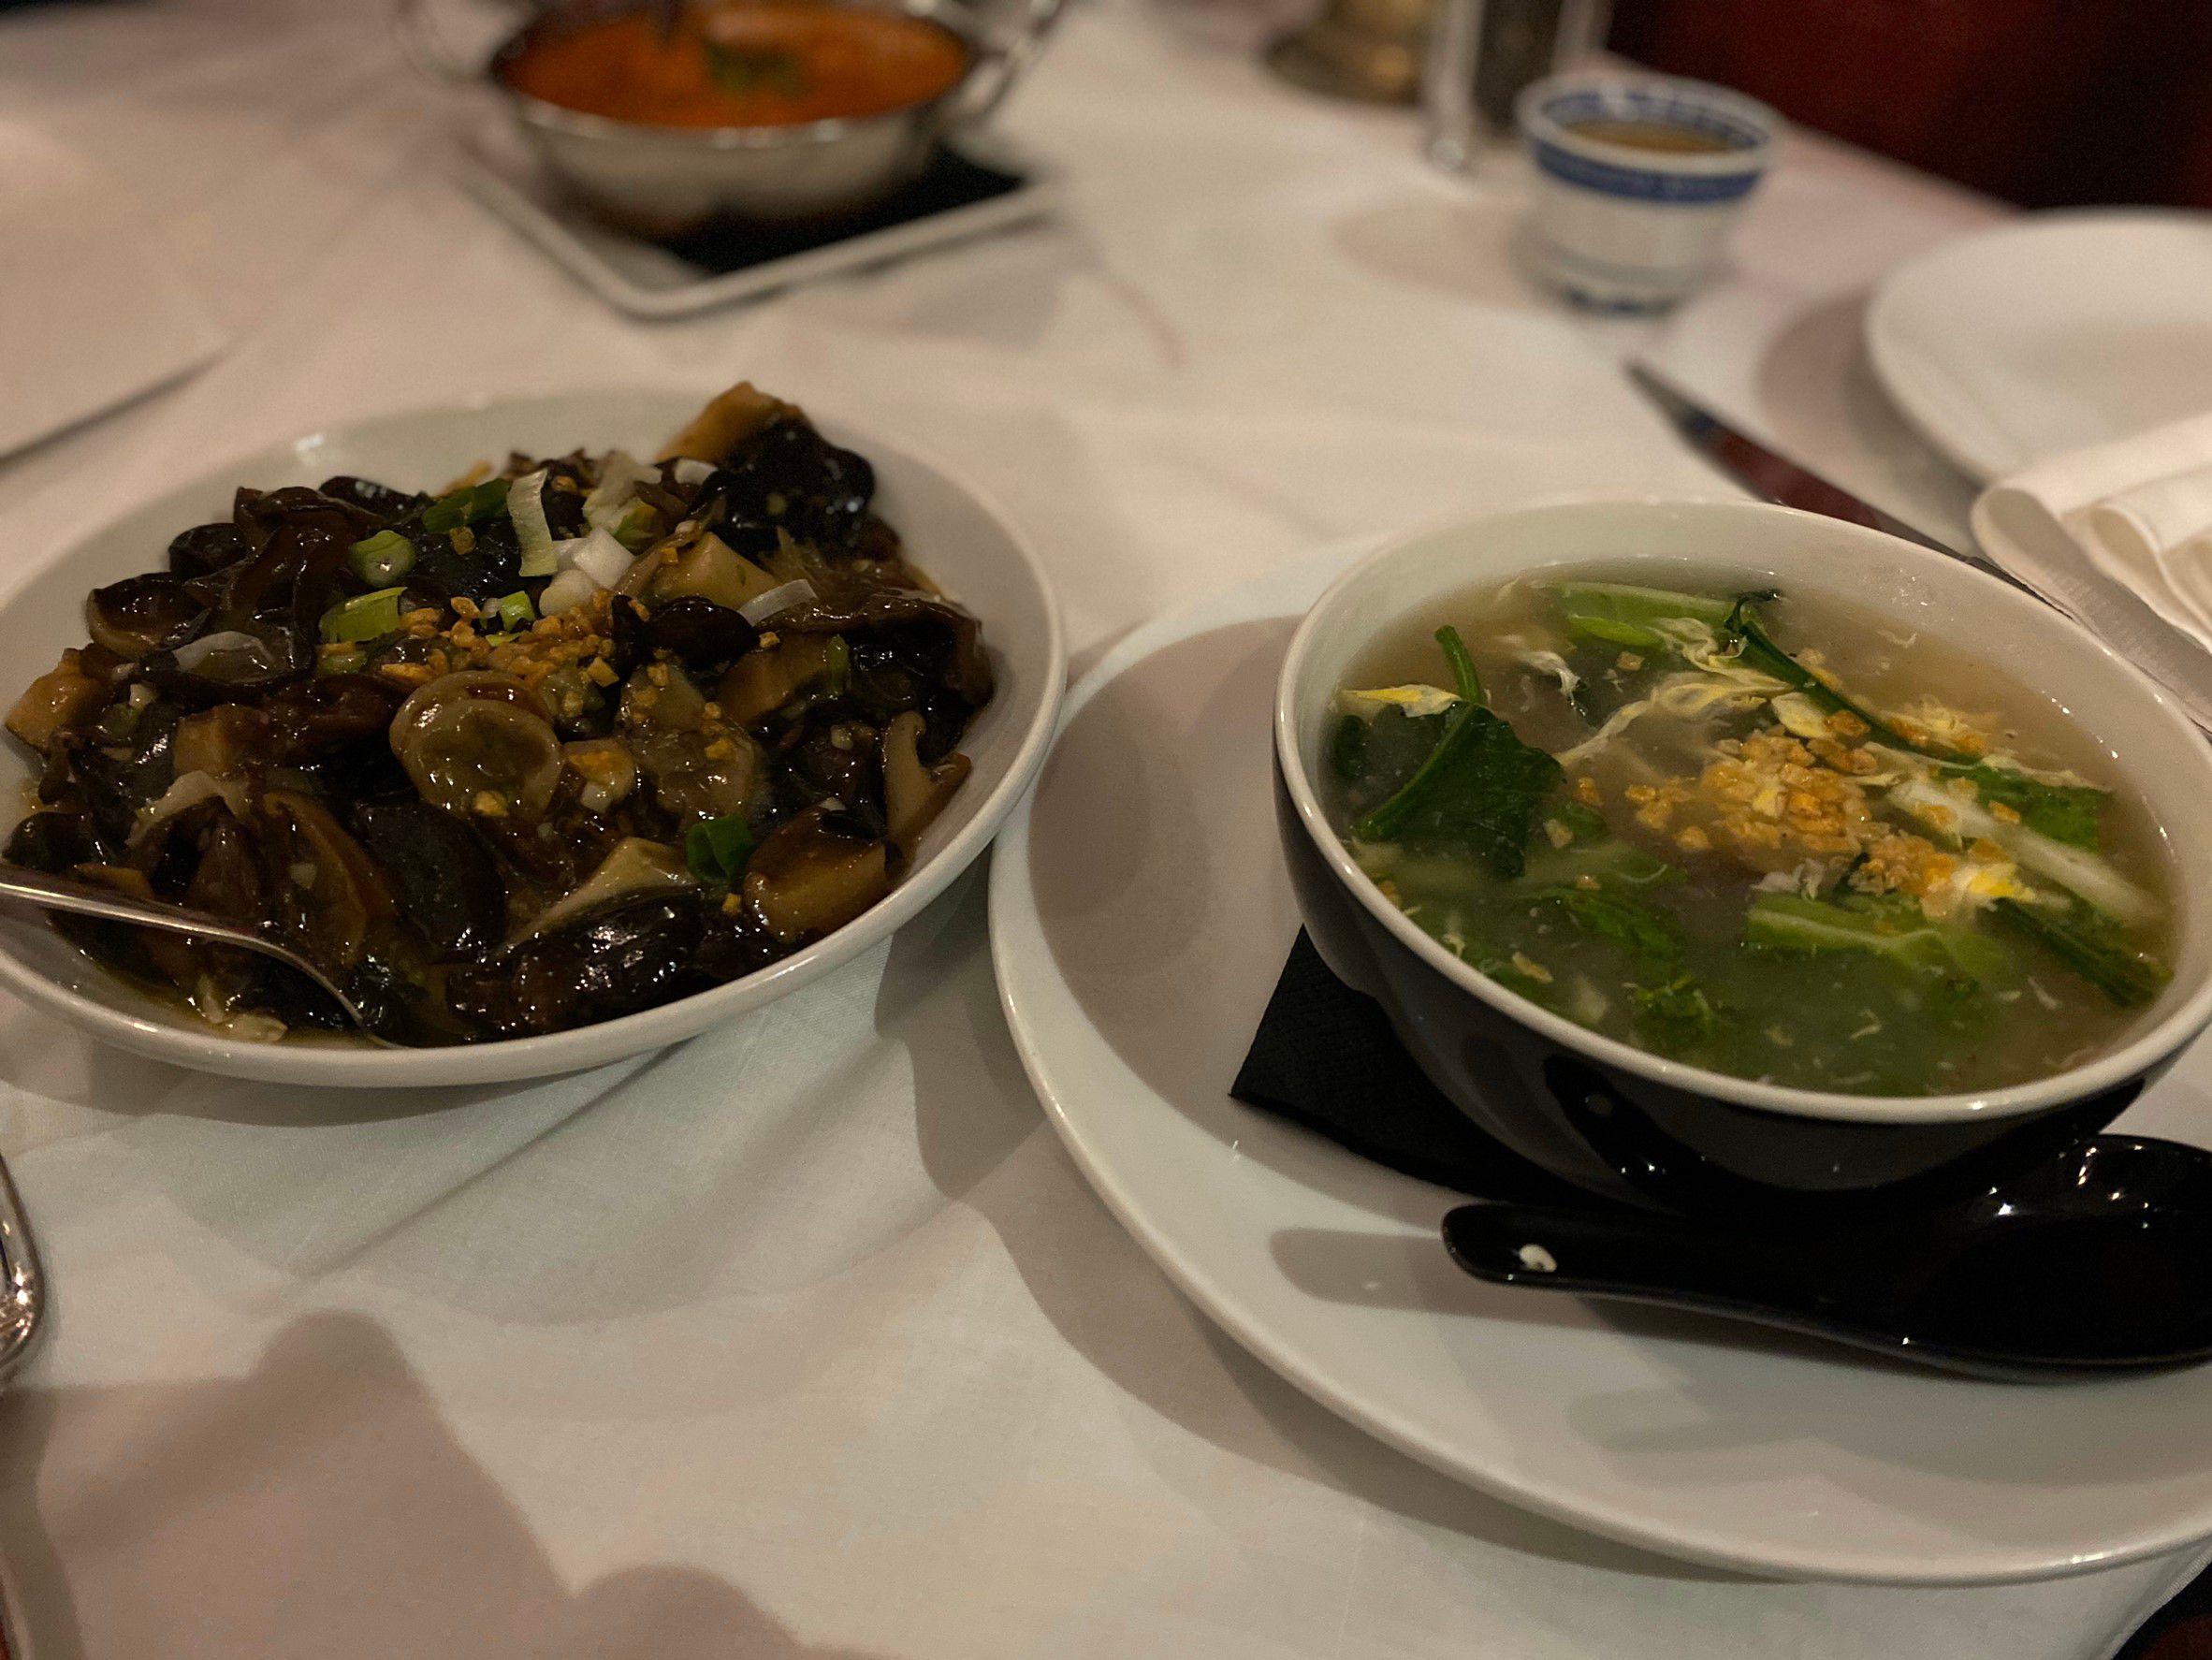 fried mushrooms, vegetable soup